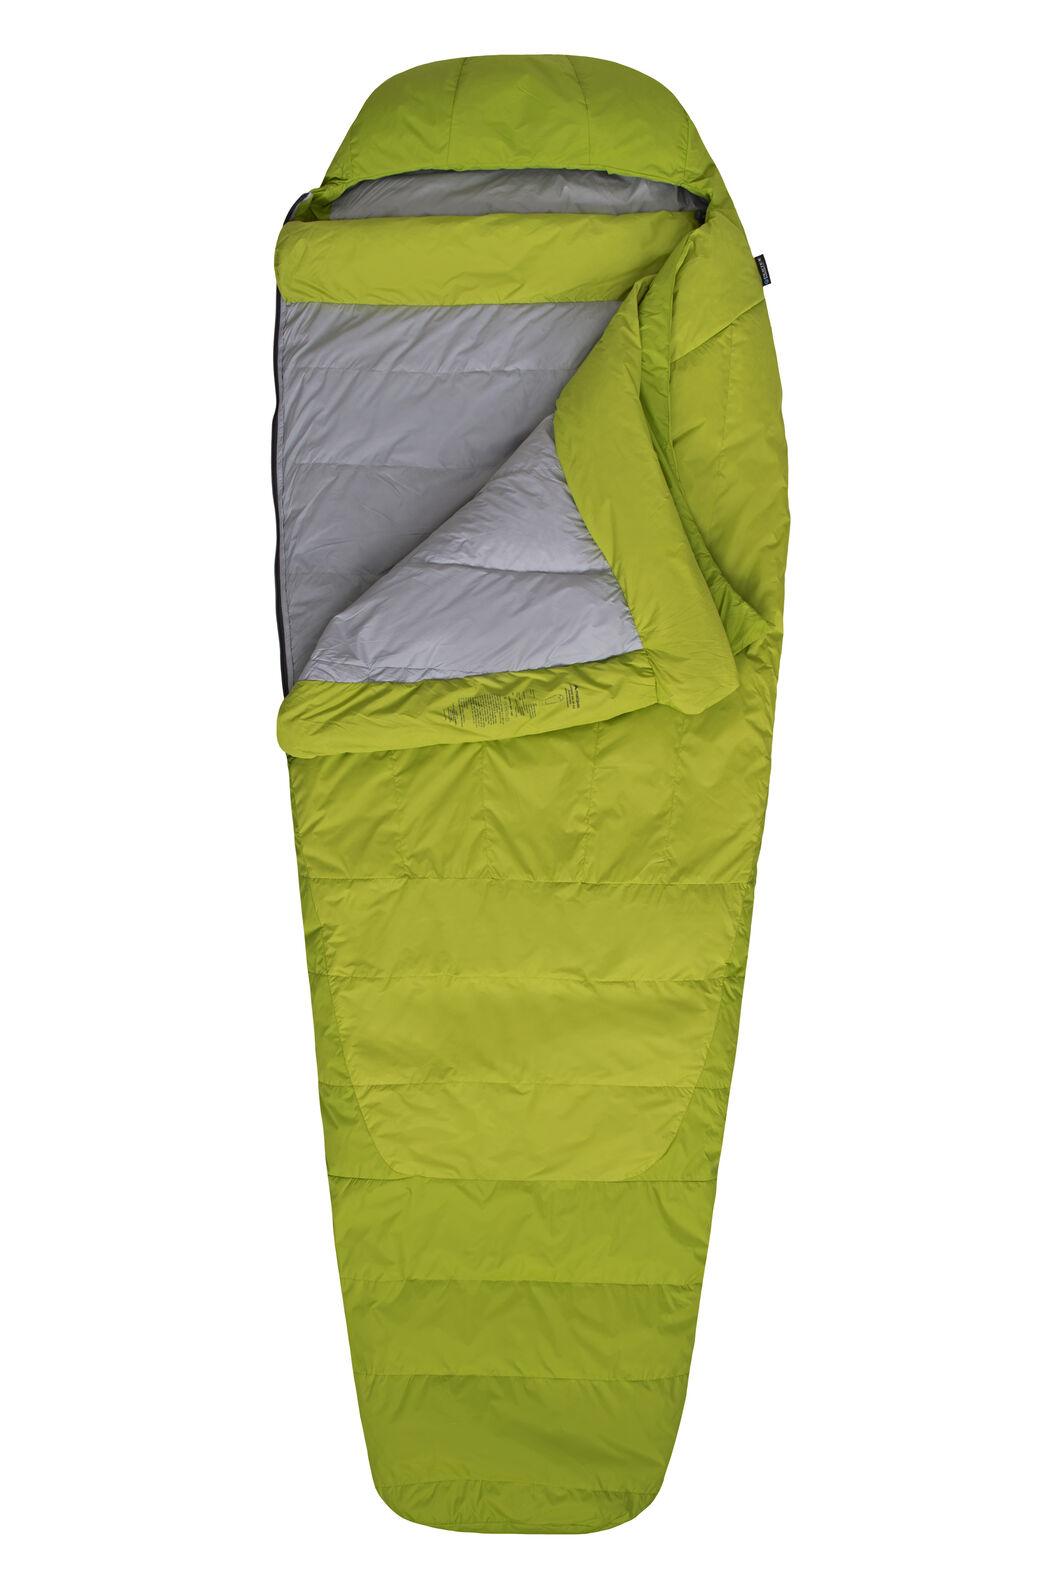 Macpac Latitude XP Goose Down 500 Sleeping Bag - Women's, Tender Shoots, hi-res